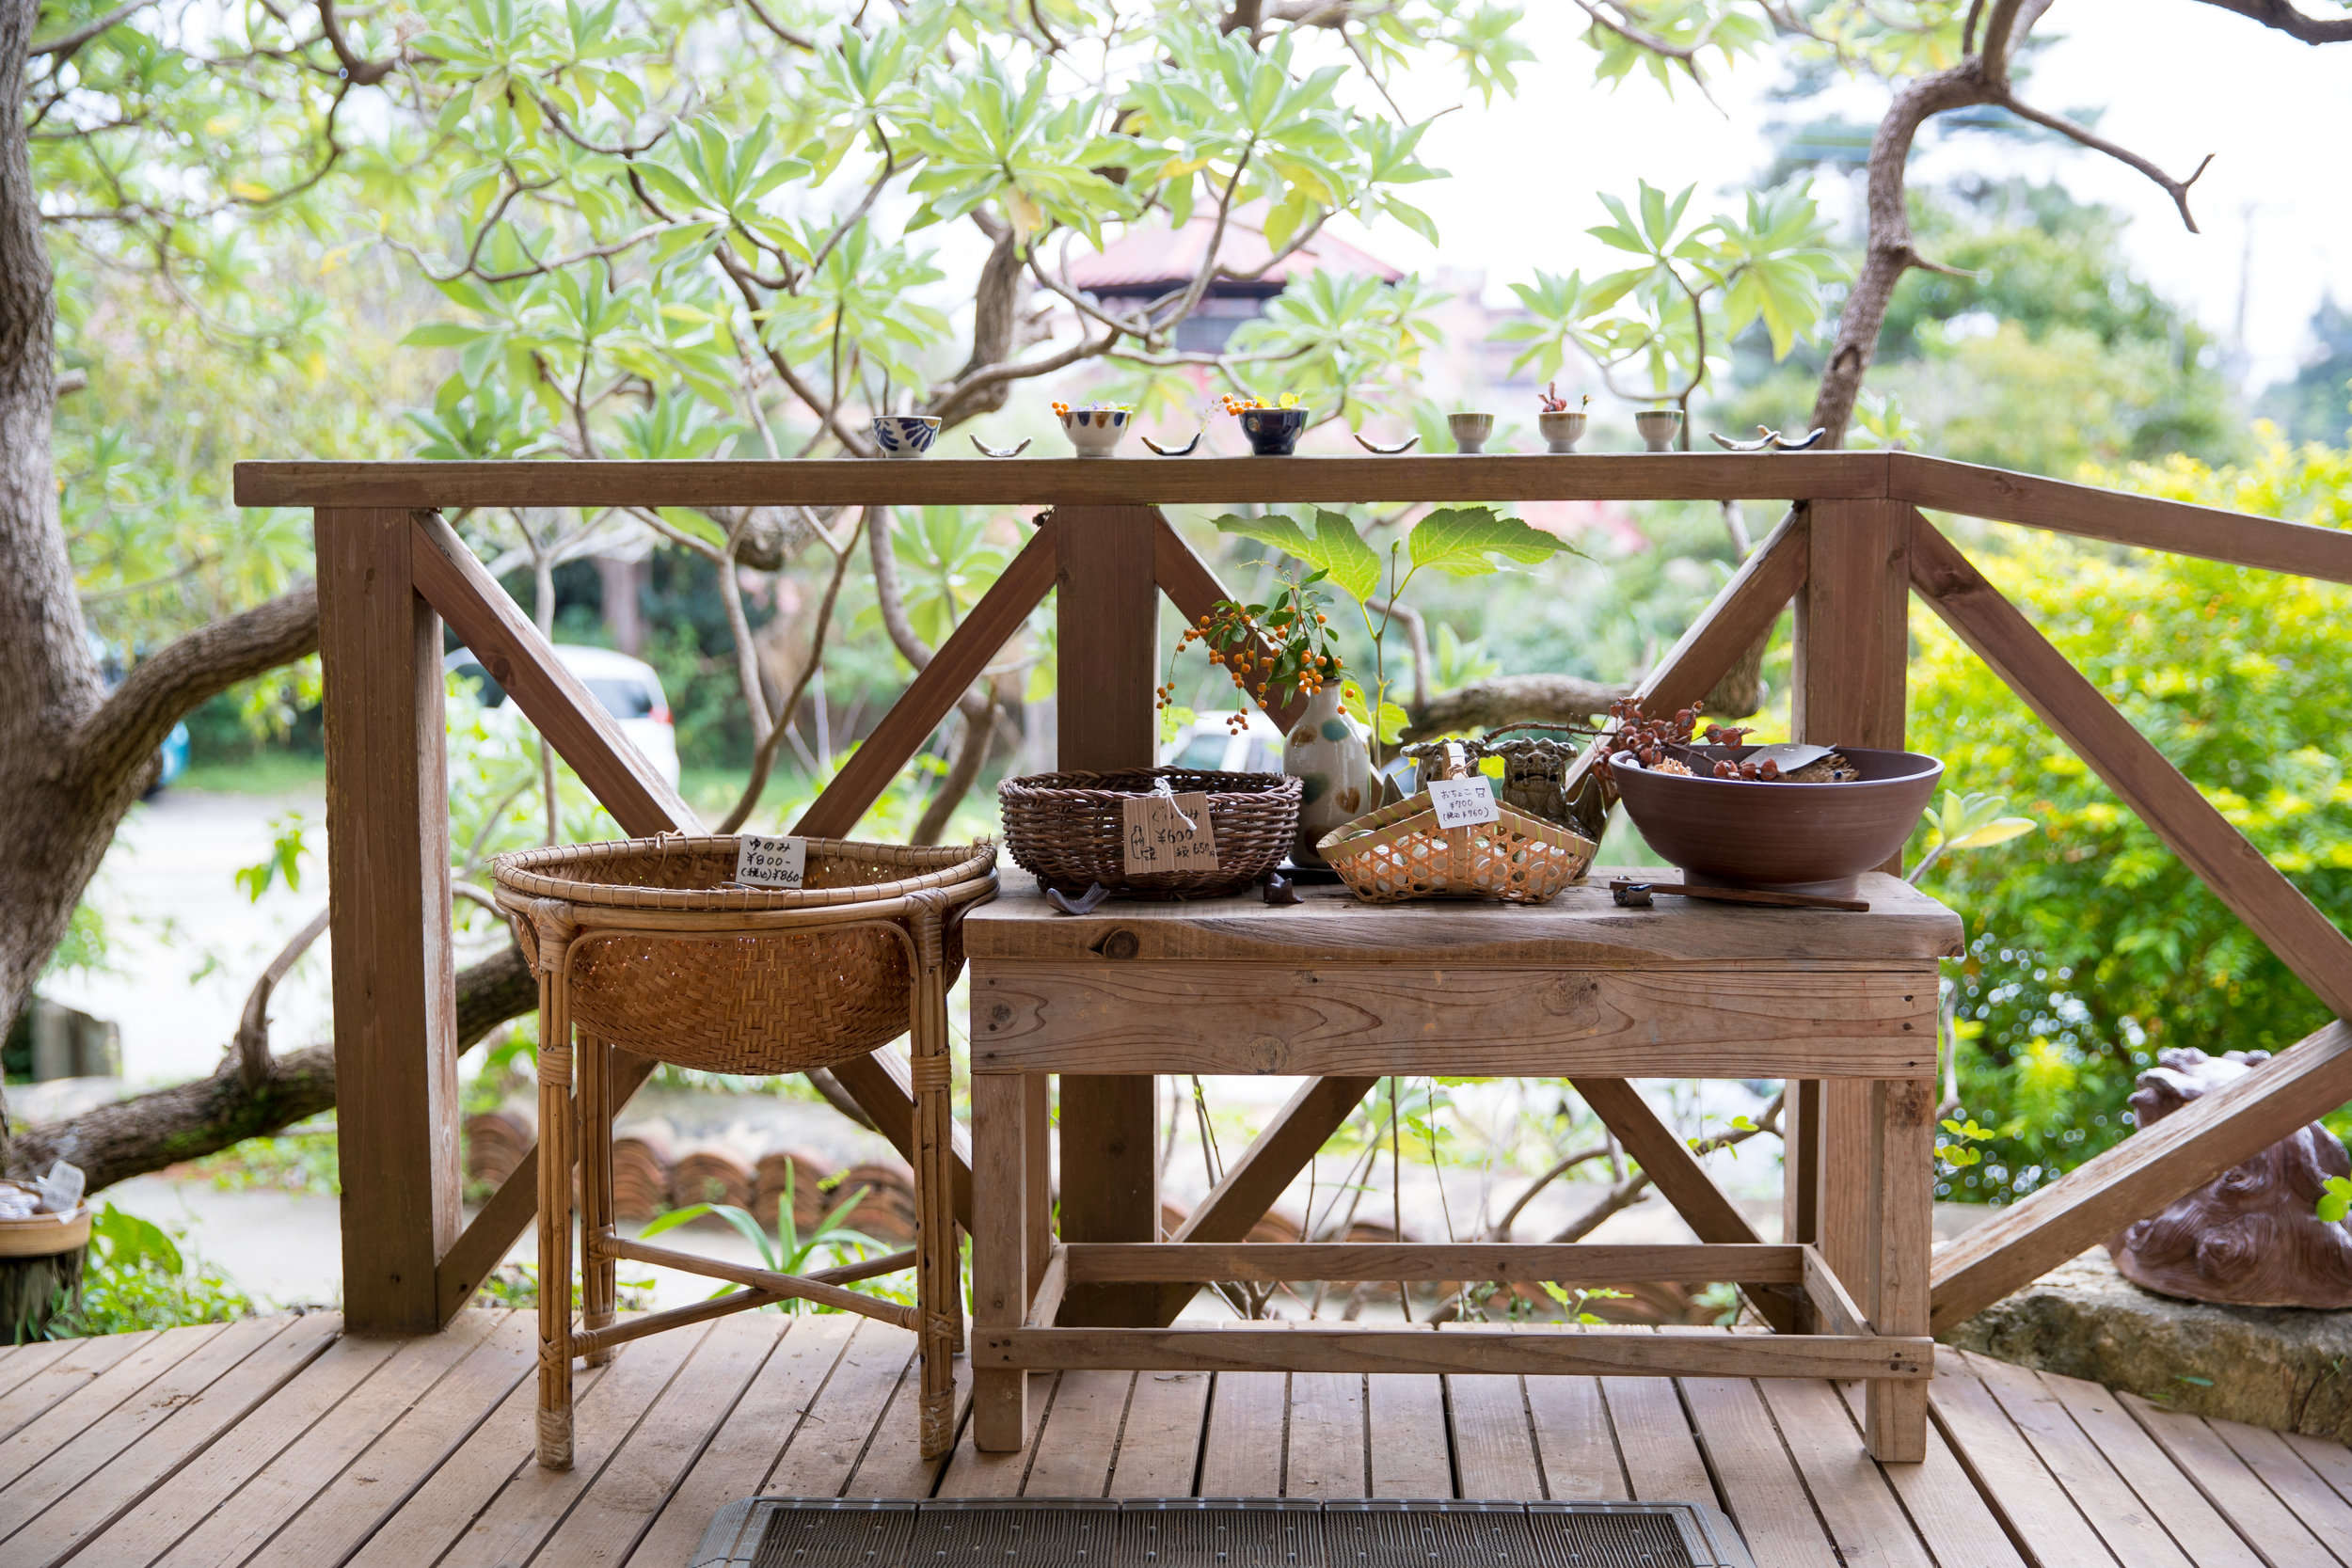 deck patio wood plants spring.jpeg